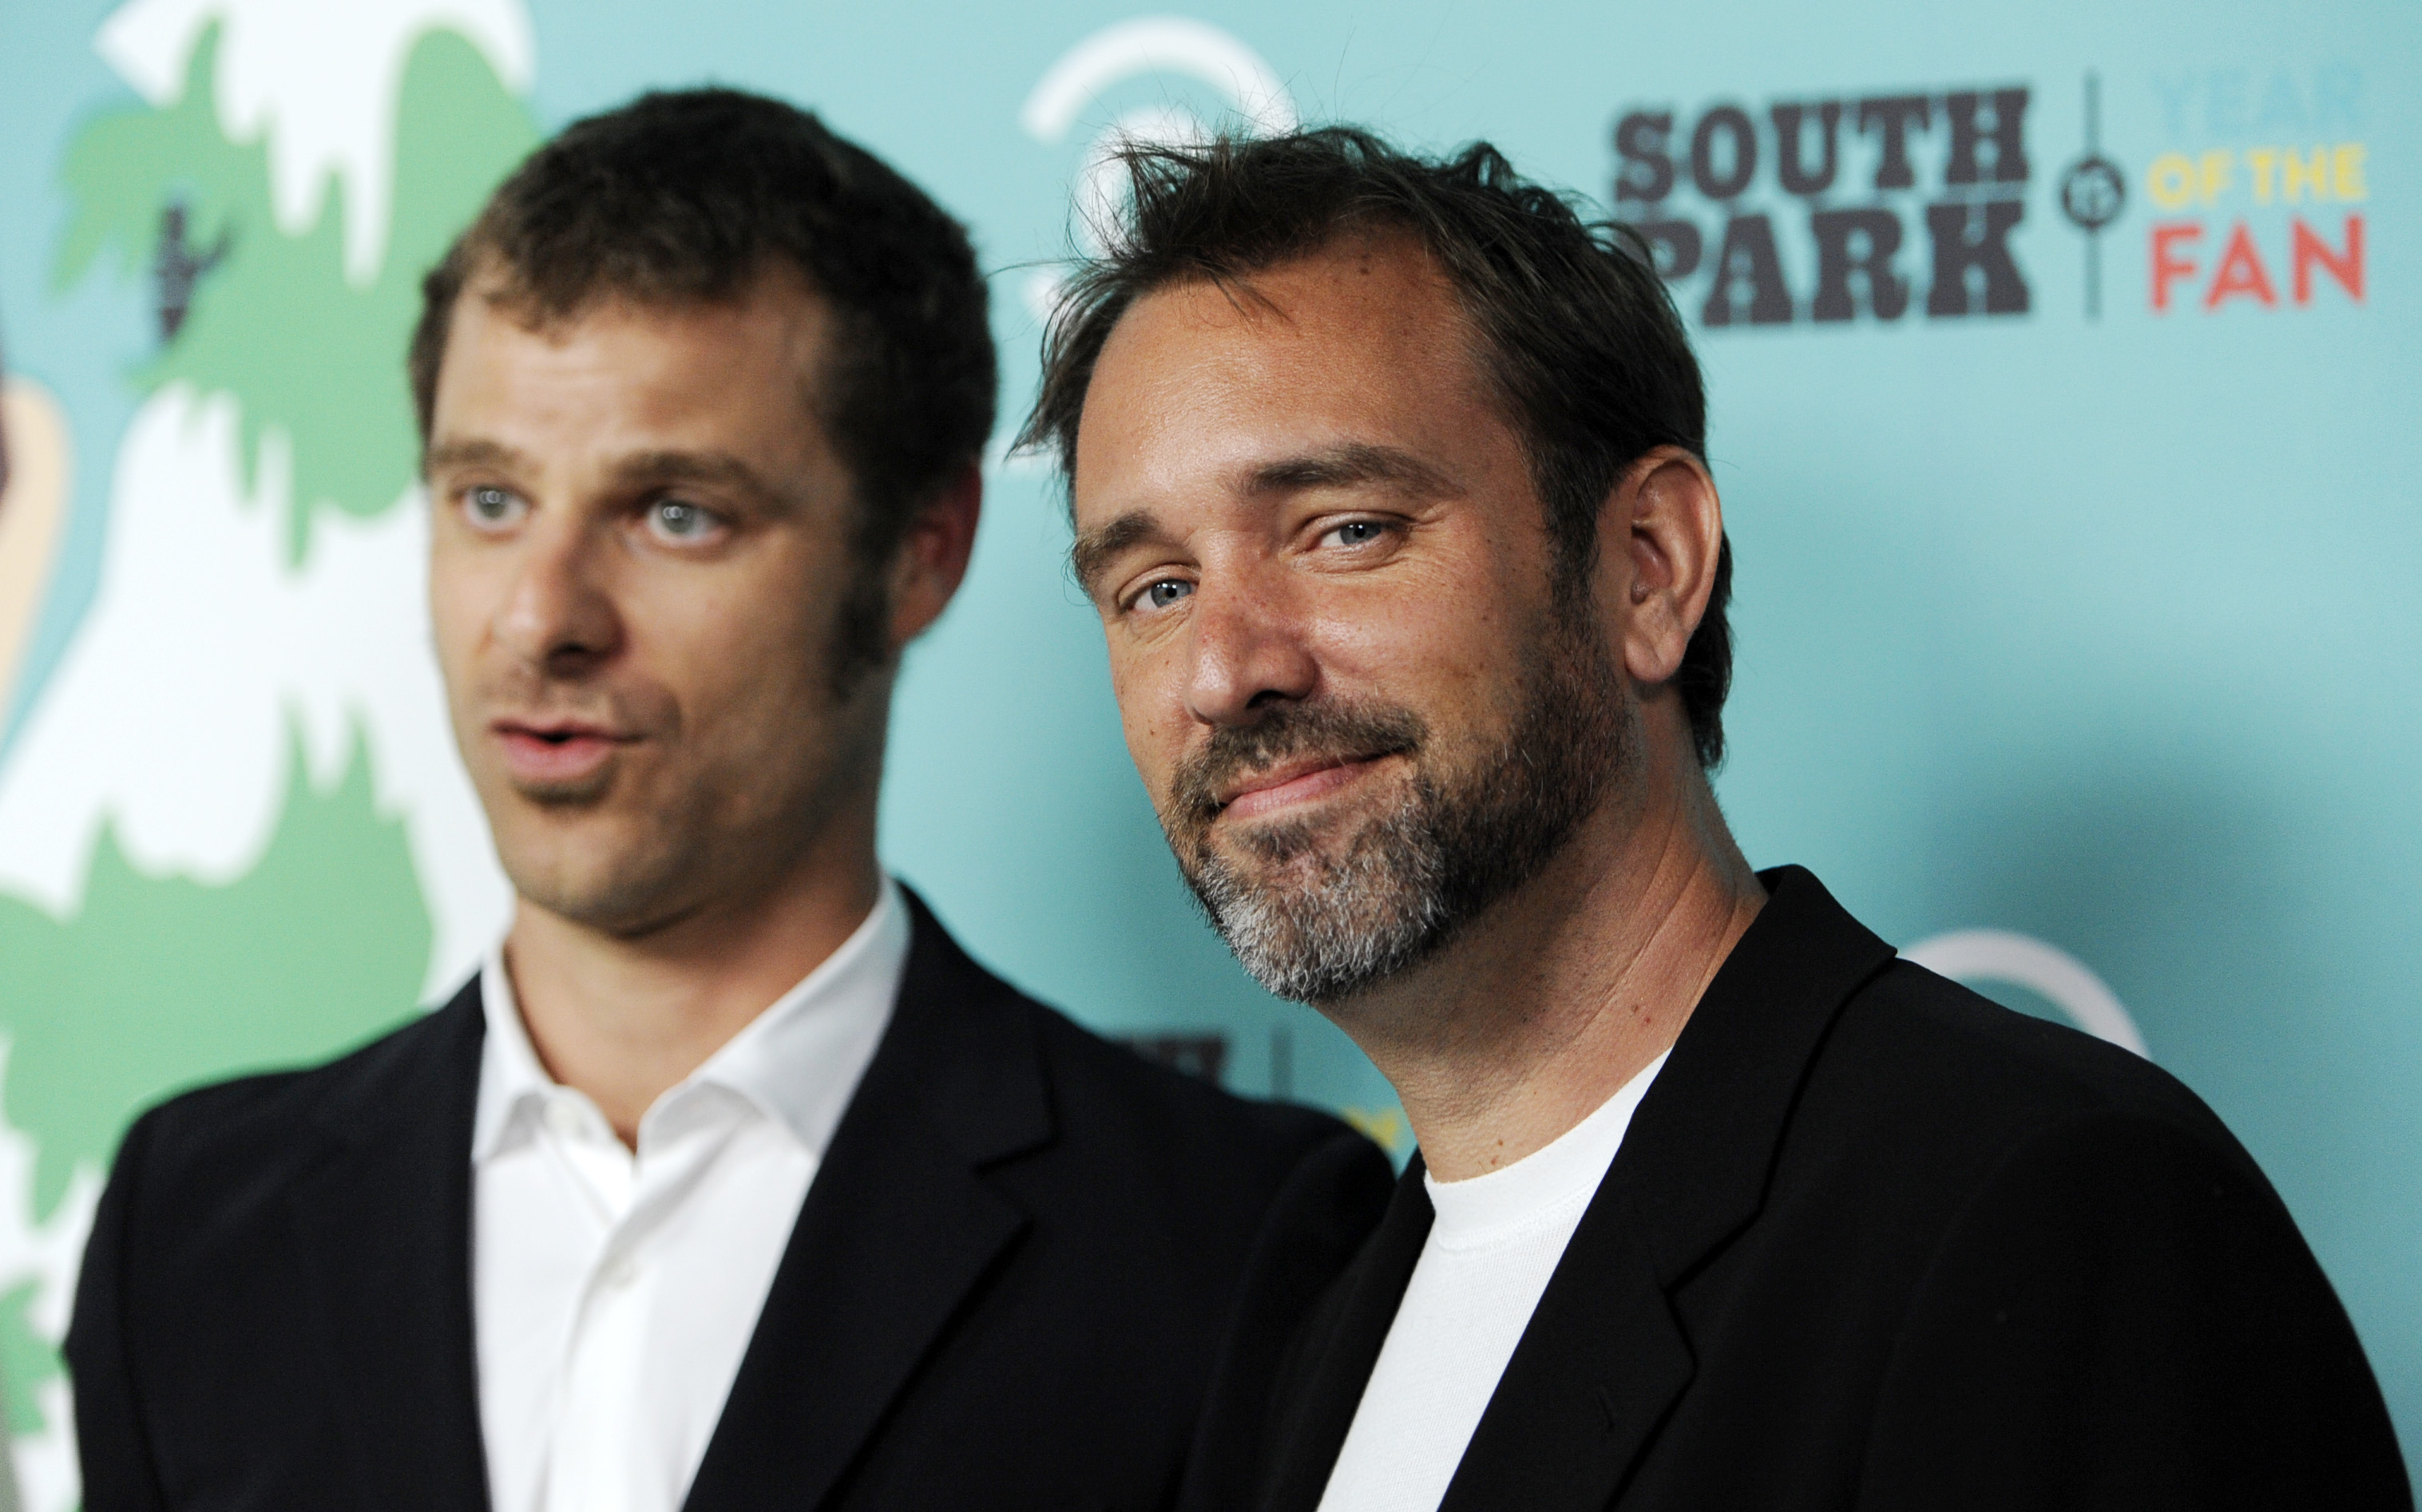 filmpolitiet south park spelet sensurert i europa